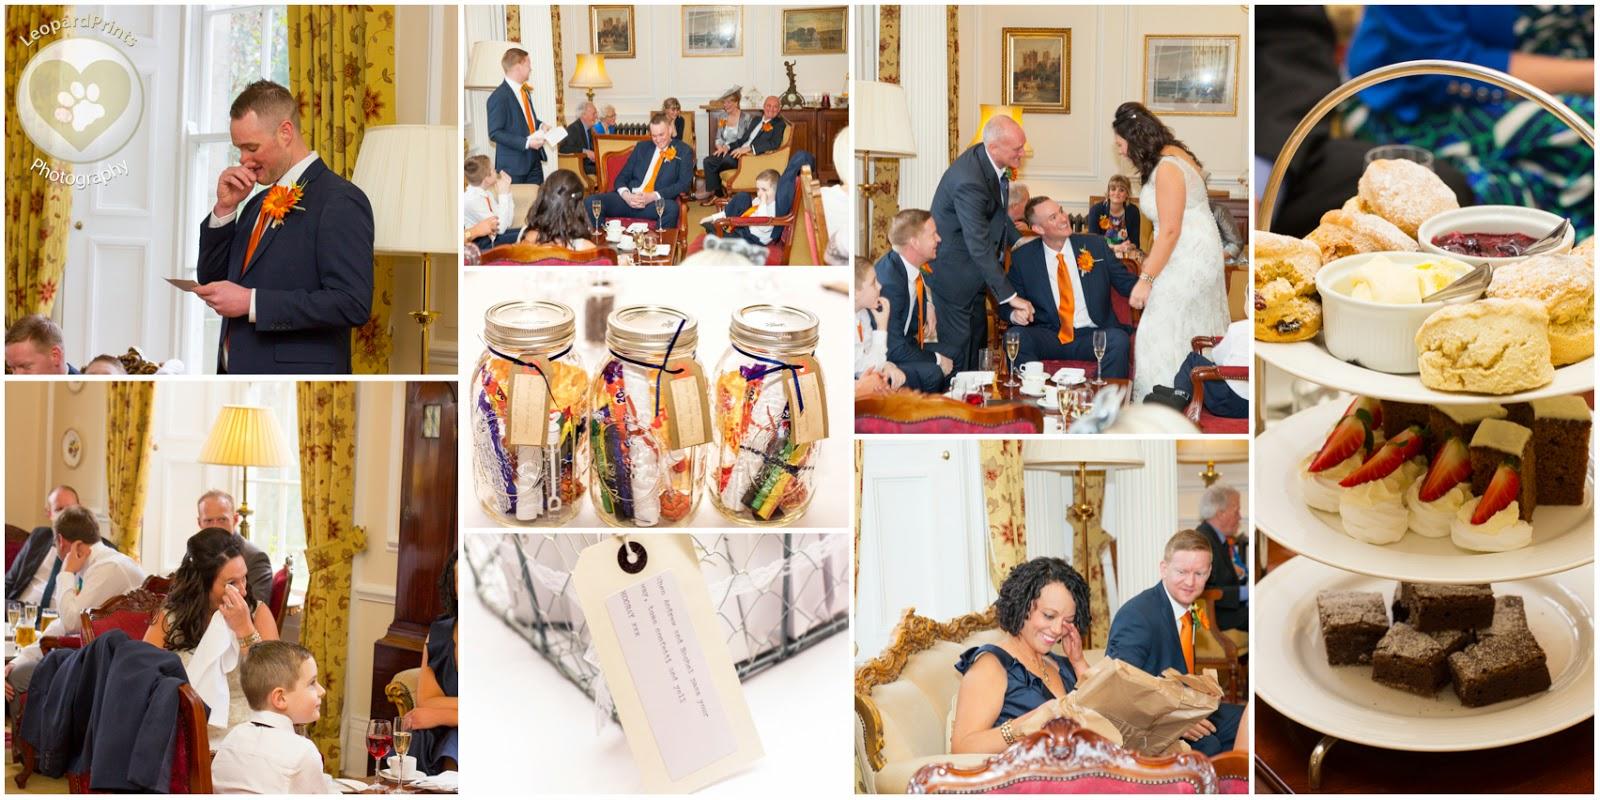 LeopardPrints Weddings: Wedding Photography Doxford Hall